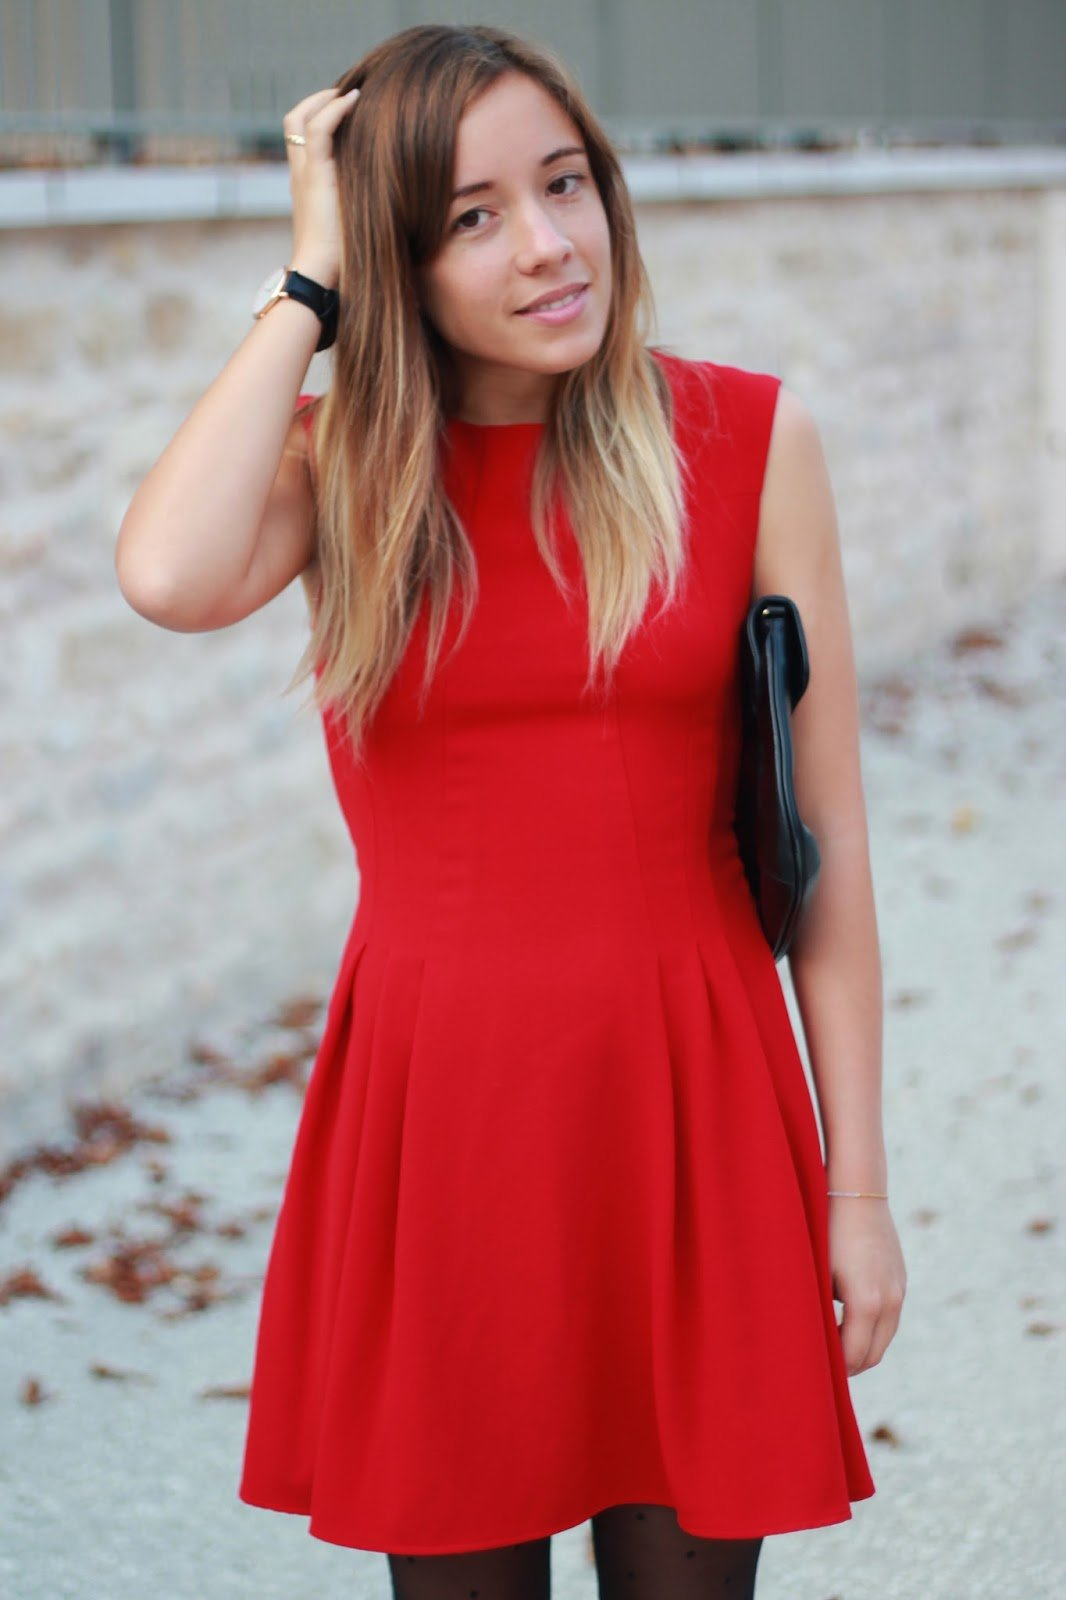 d dramatiser la petite robe rouge la penderie de chlo blog mode. Black Bedroom Furniture Sets. Home Design Ideas